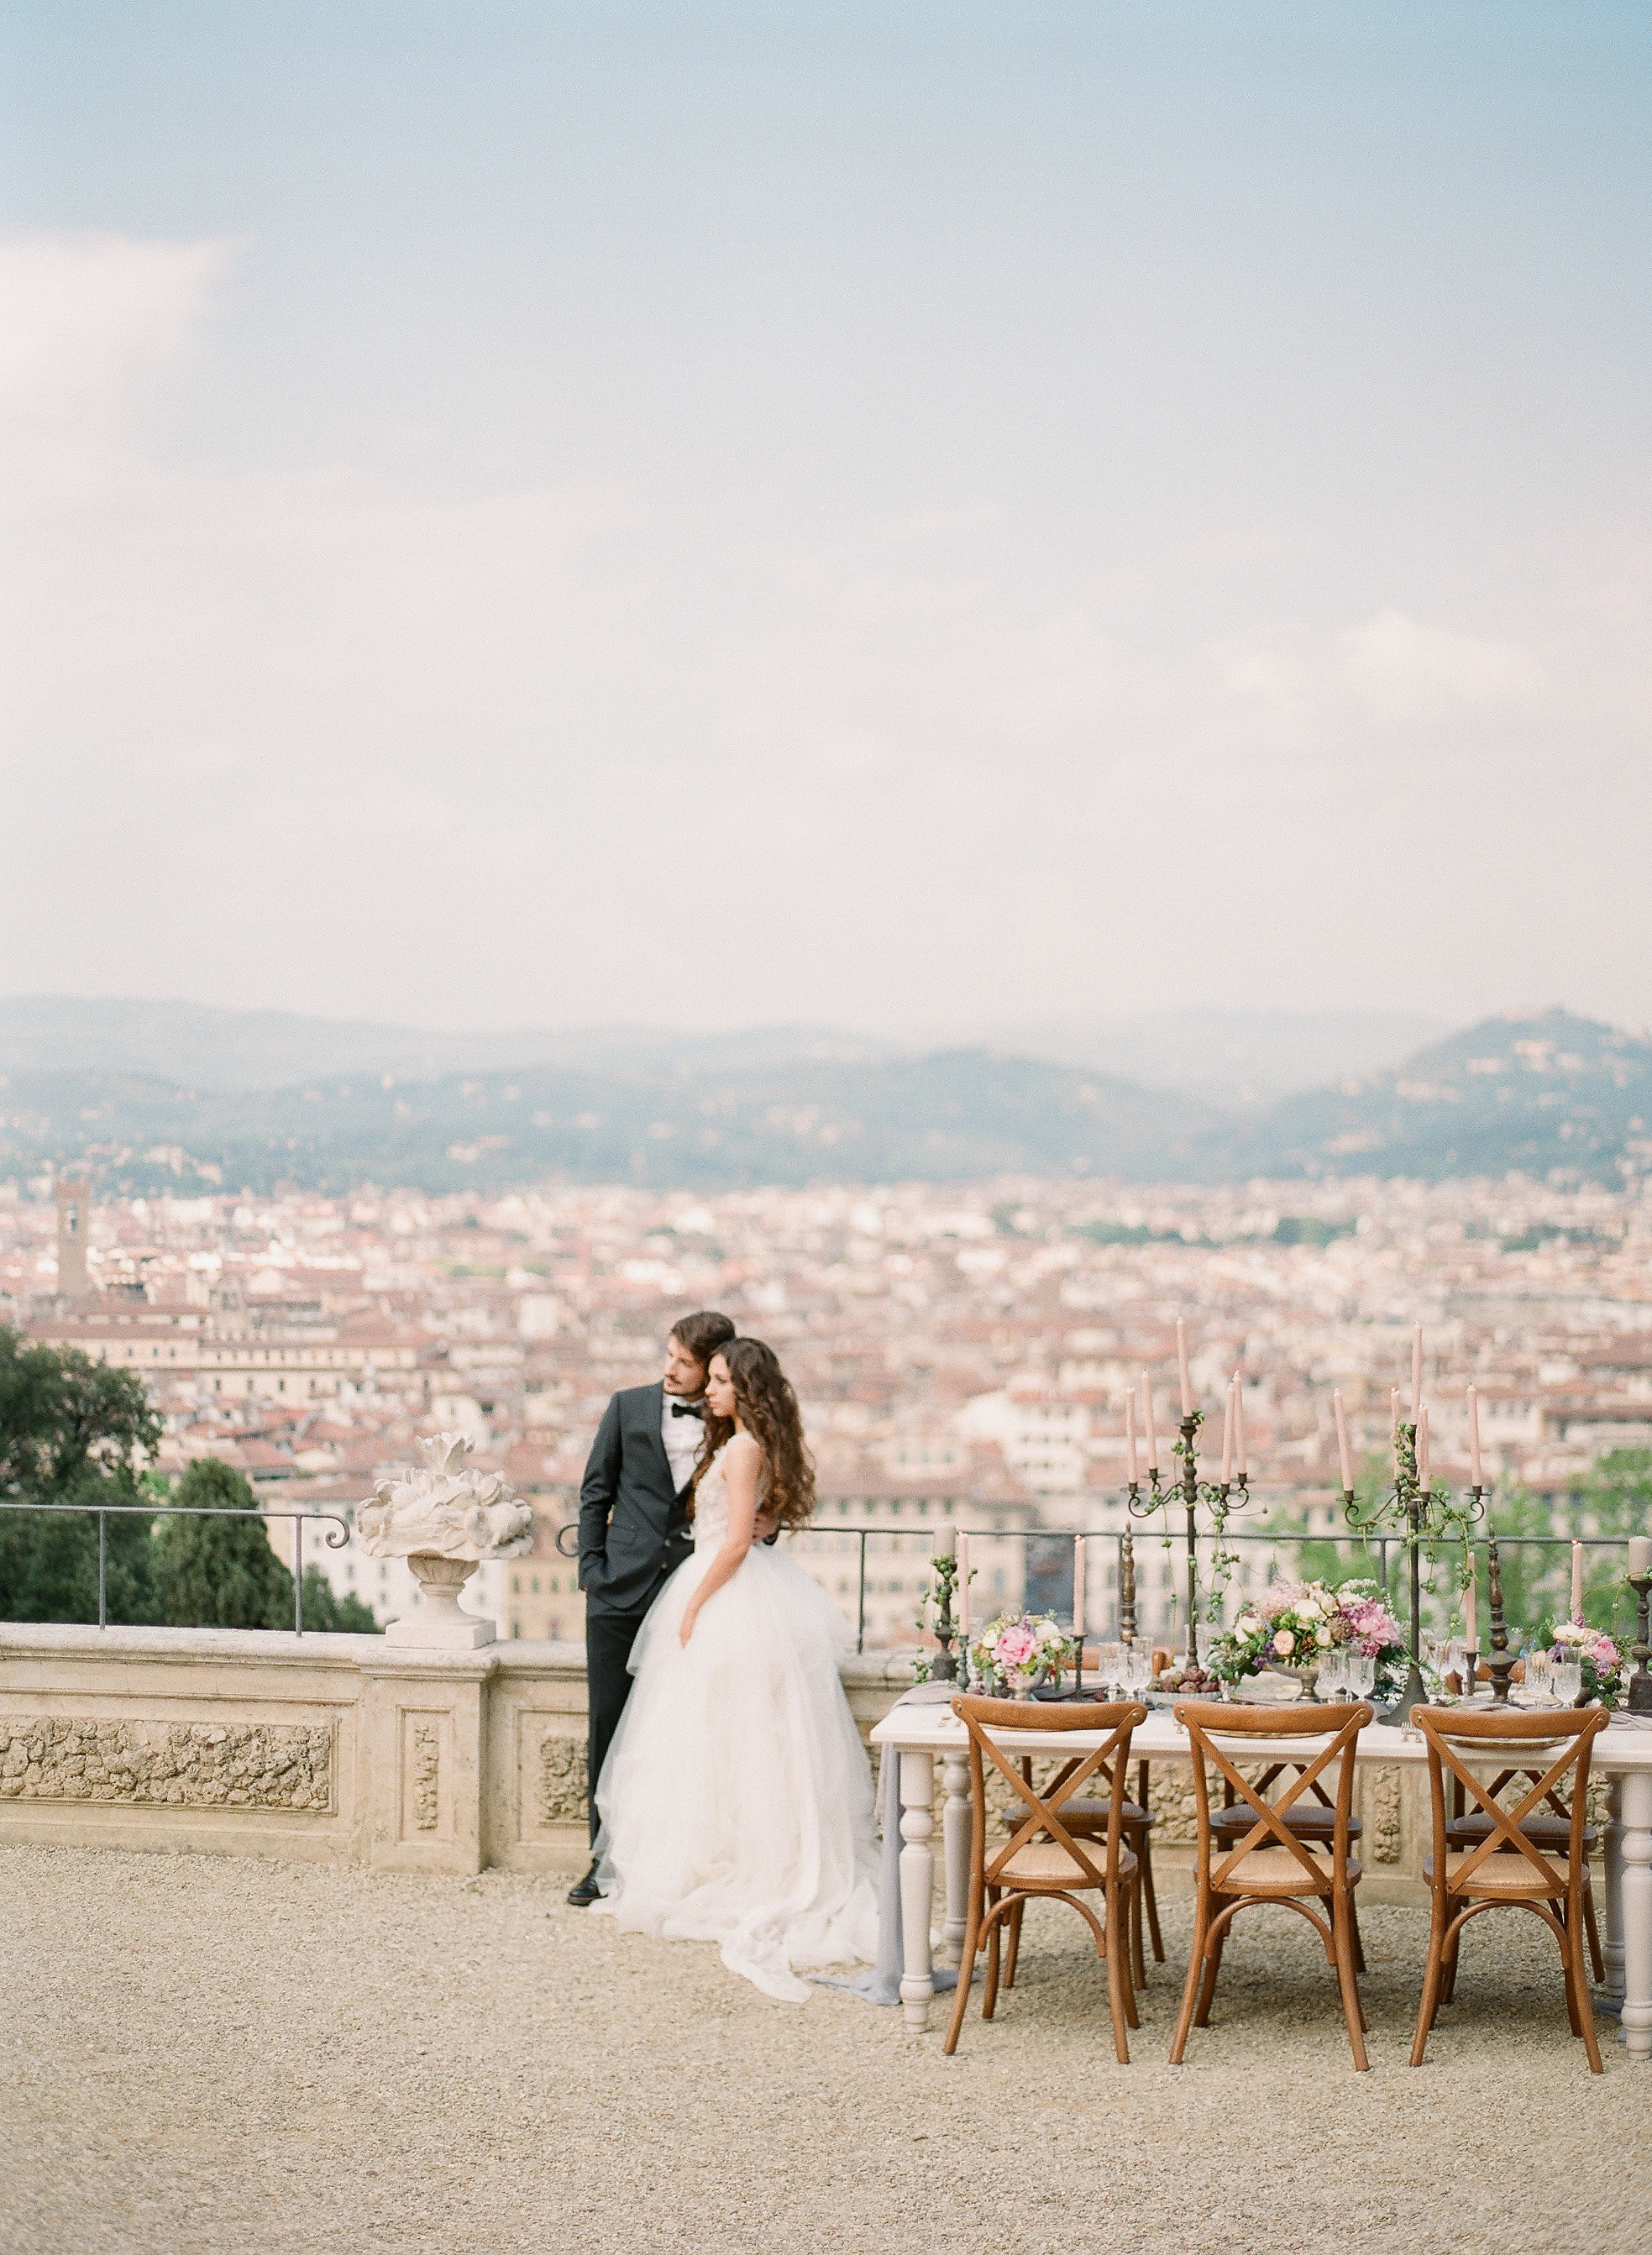 JennySoiPhotography-ItalyEditorial-211